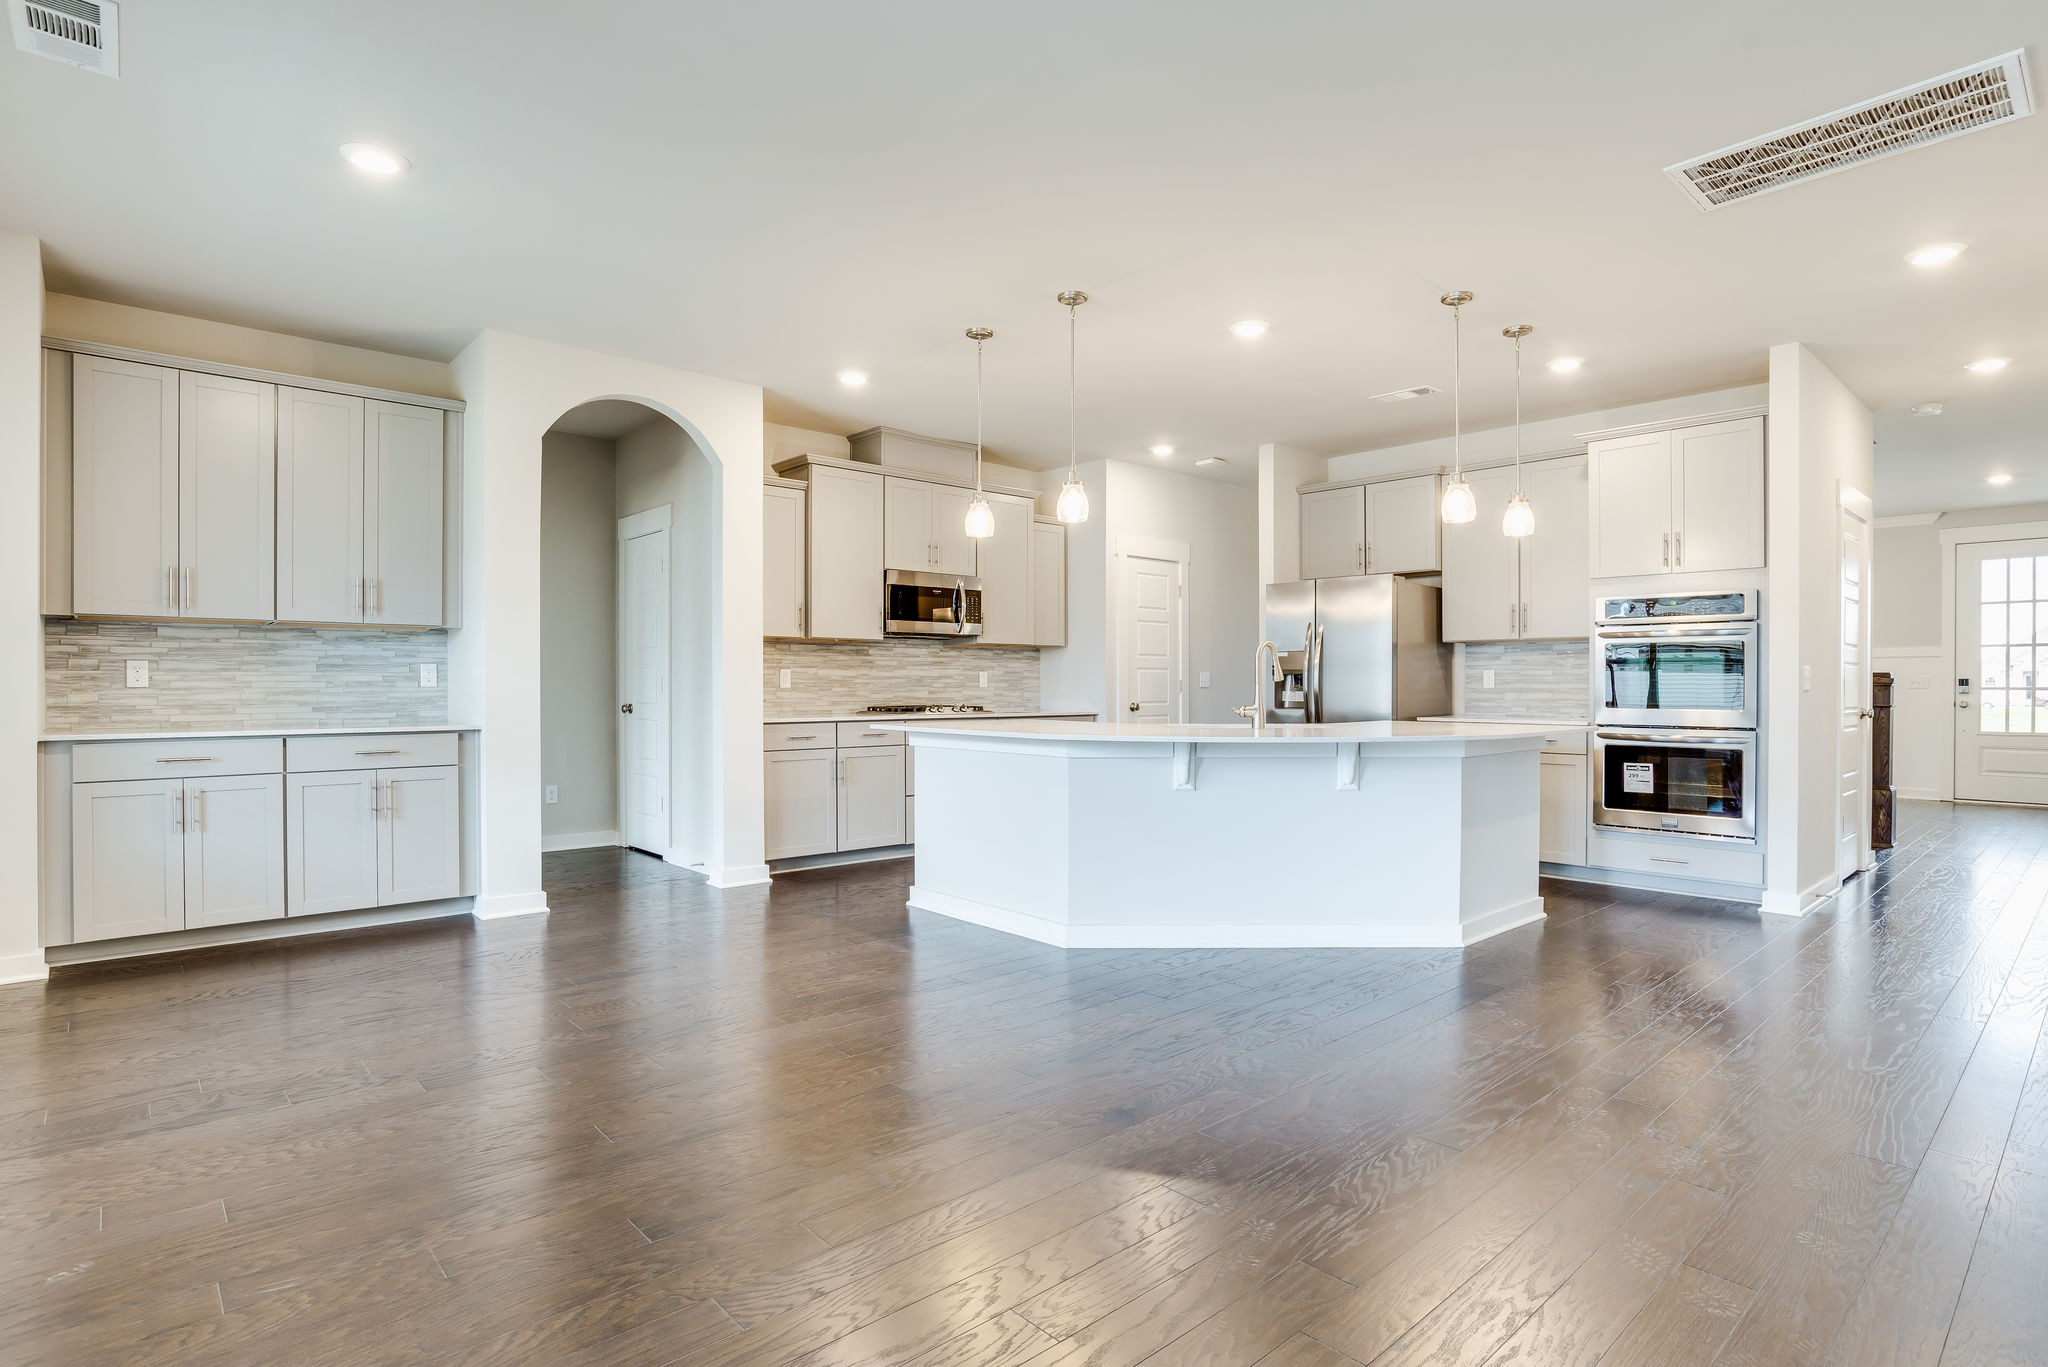 4723 Lapis Lane- Lot 220o, Murfreesboro, TN 37128 - Murfreesboro, TN real estate listing